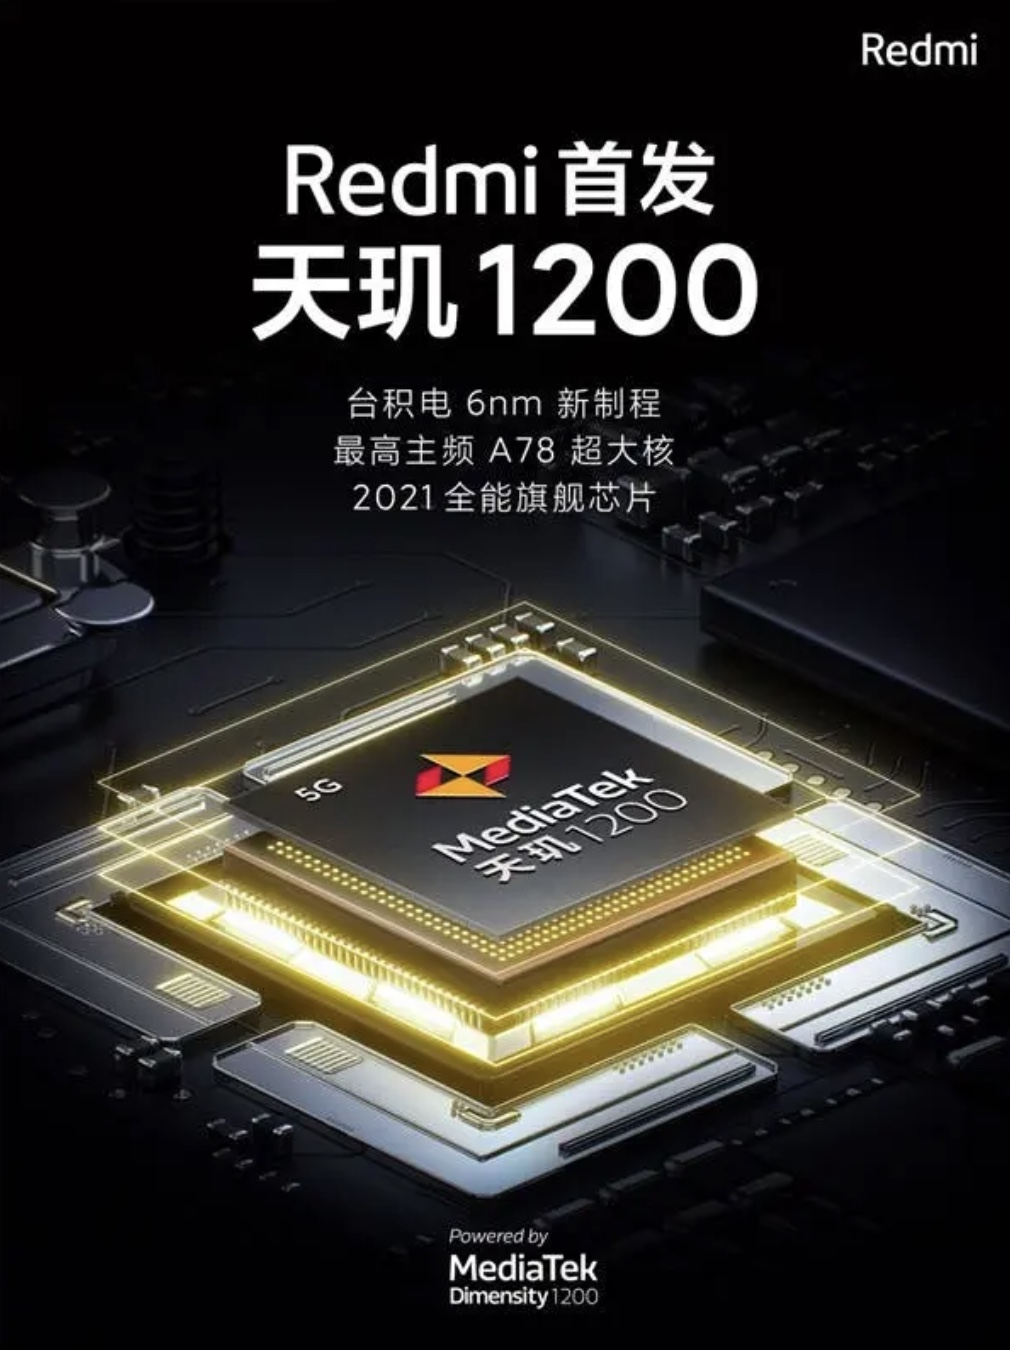 Redmi MediaTek Dimensity 1200